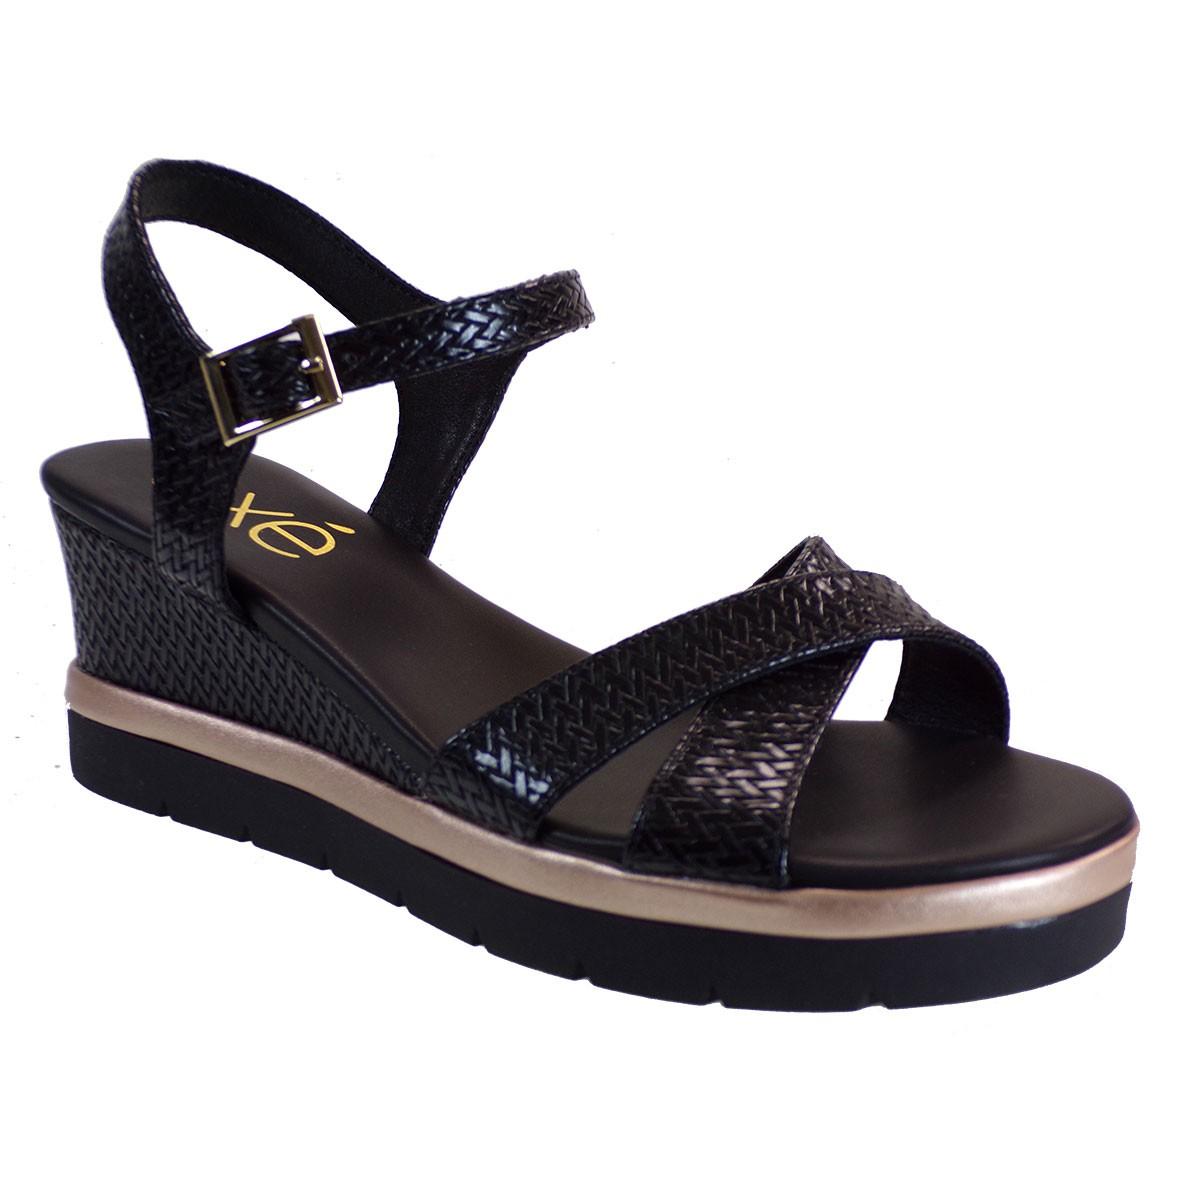 EXE Shoes Γυναικεία Πέδιλα Πλατφόρμες IPANEMA-920 Μαύρο Πλεκτό M47009203574